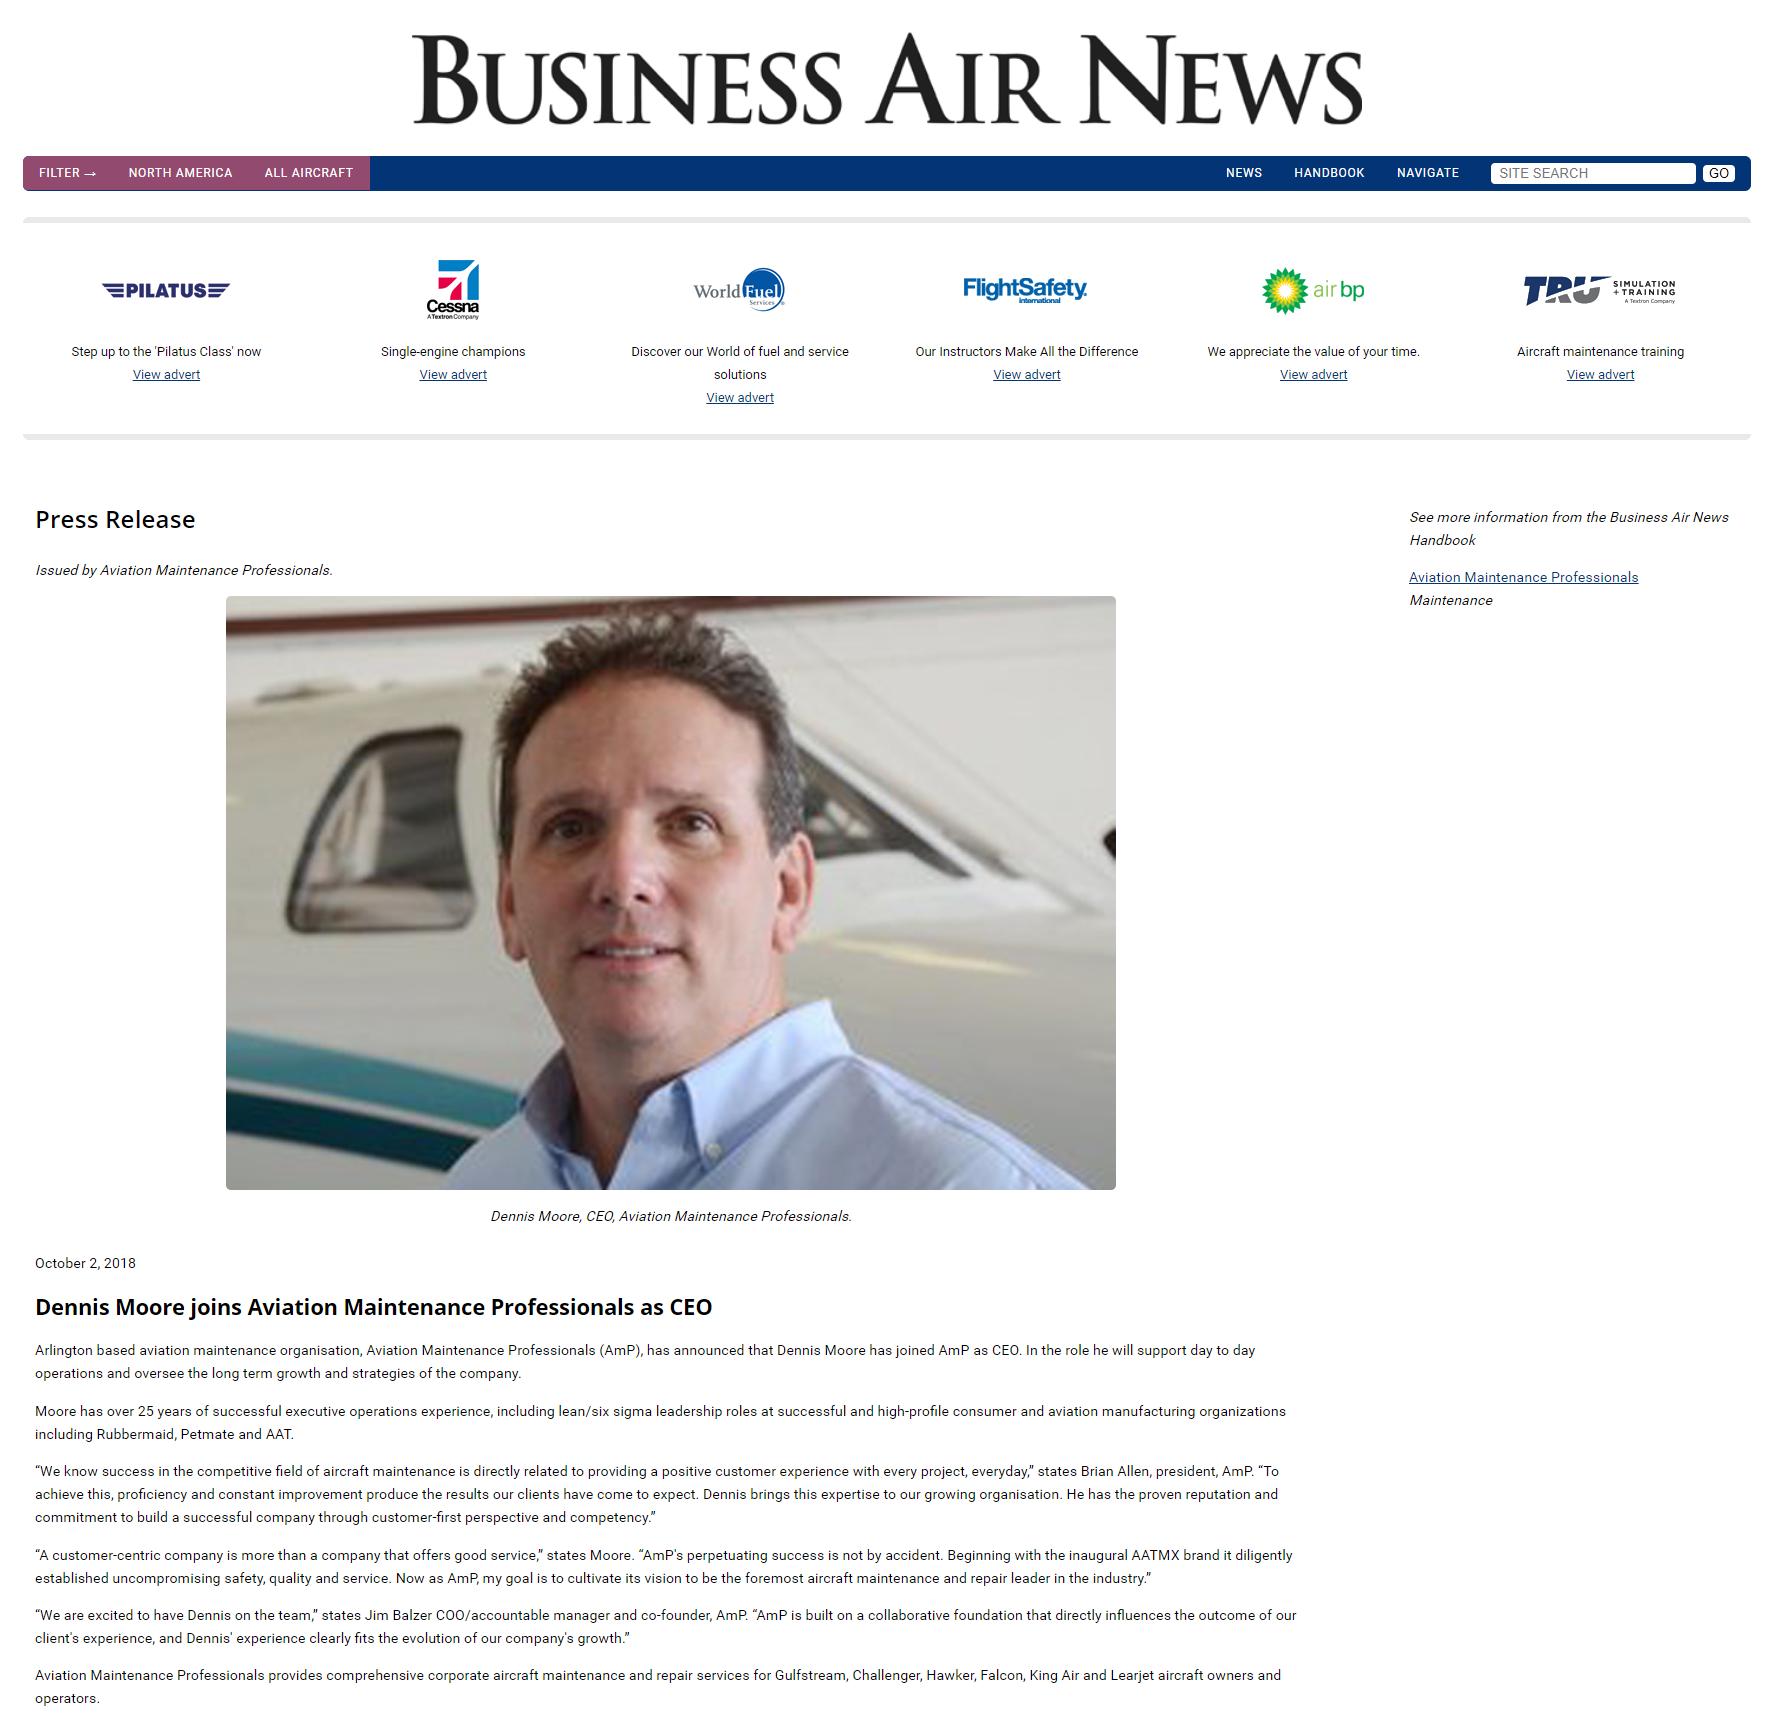 screencapture-businessairnews-hb_news_story-html-2018-10-18-16_37_31.png